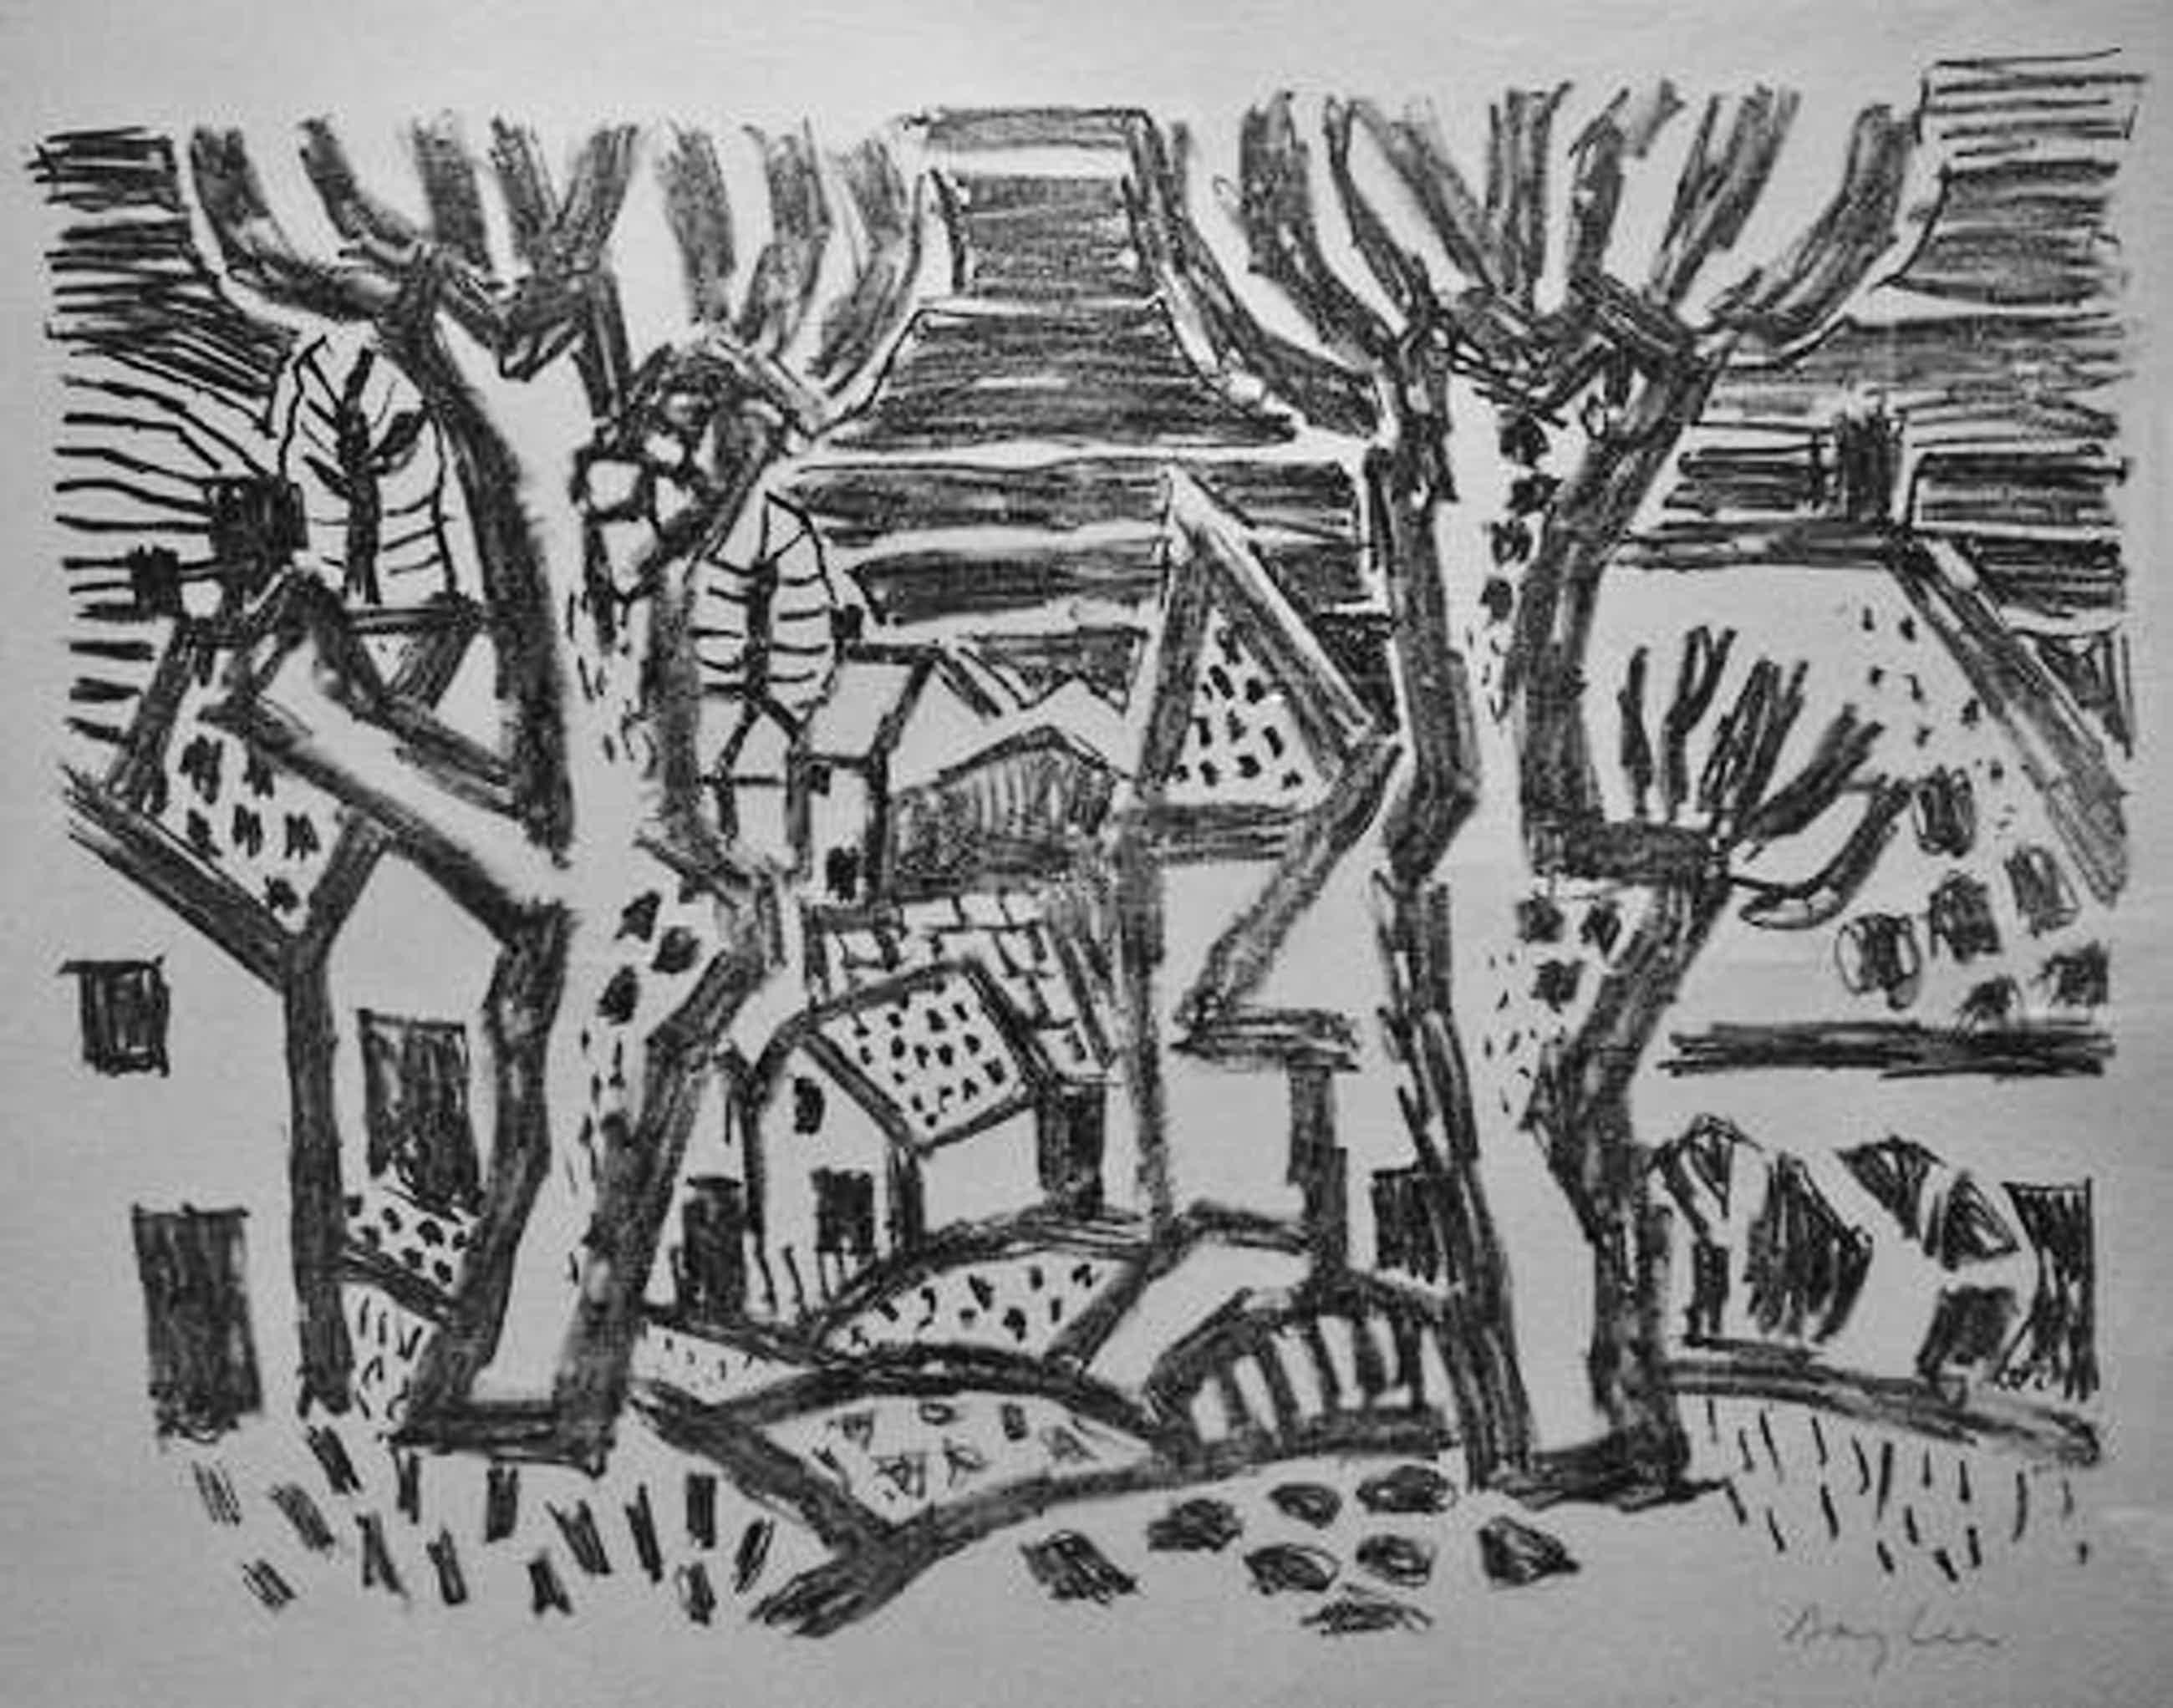 Eduard Bargheer - Häuser in Blankenese - handsignierte Lithographie auf Bütten, 1955 kopen? Bied vanaf 120!